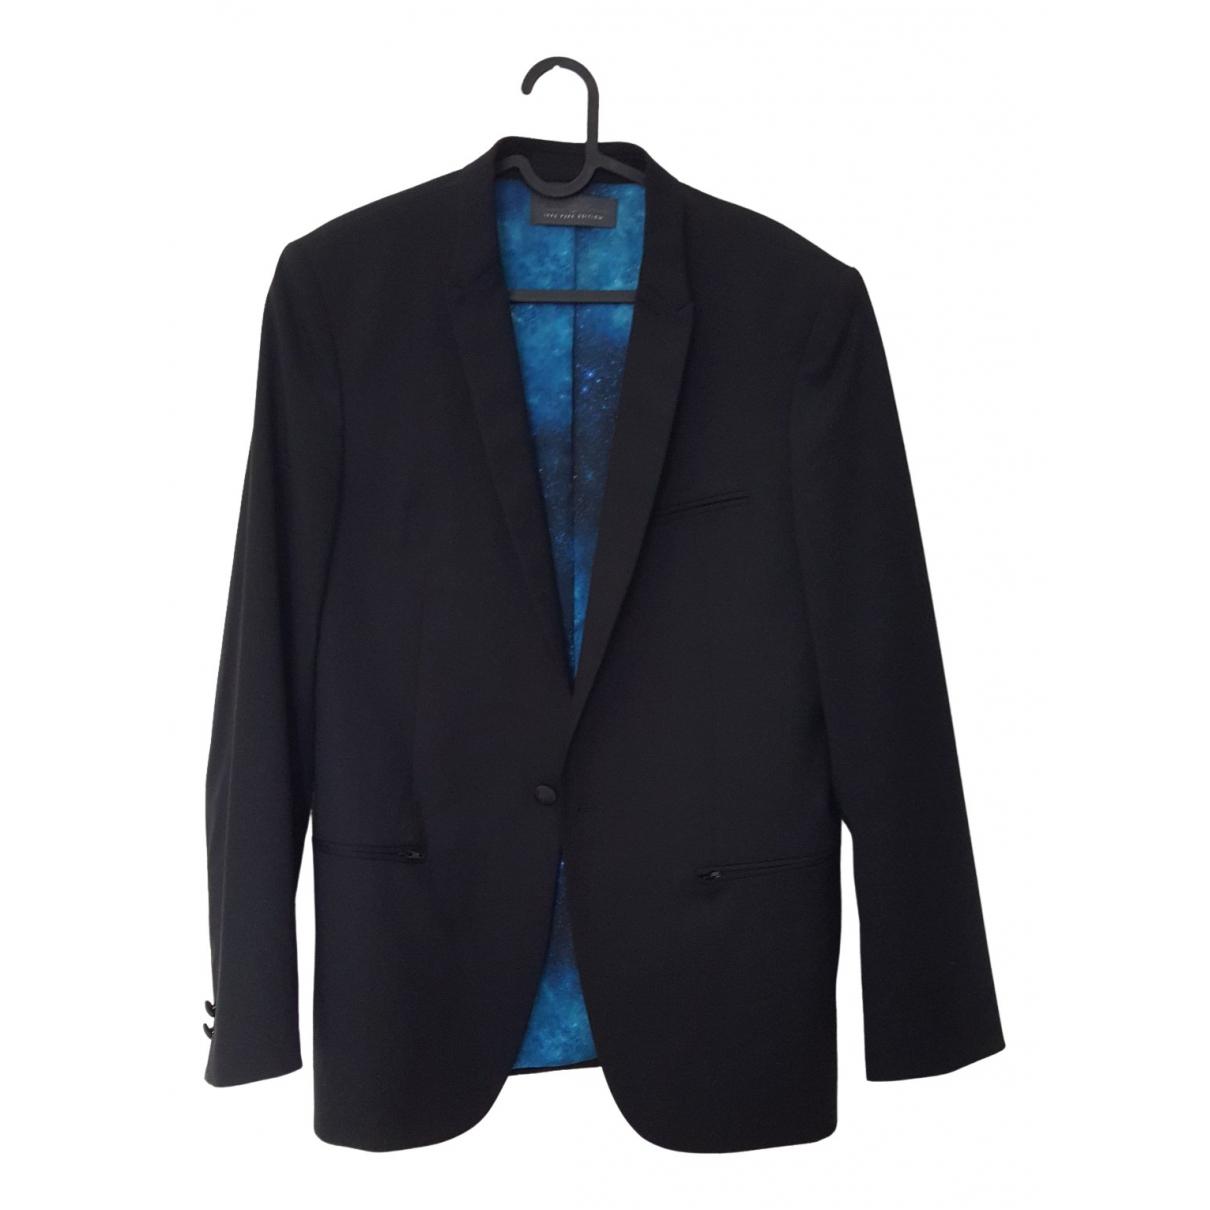 Ikks \N Black Wool jacket  for Men S International